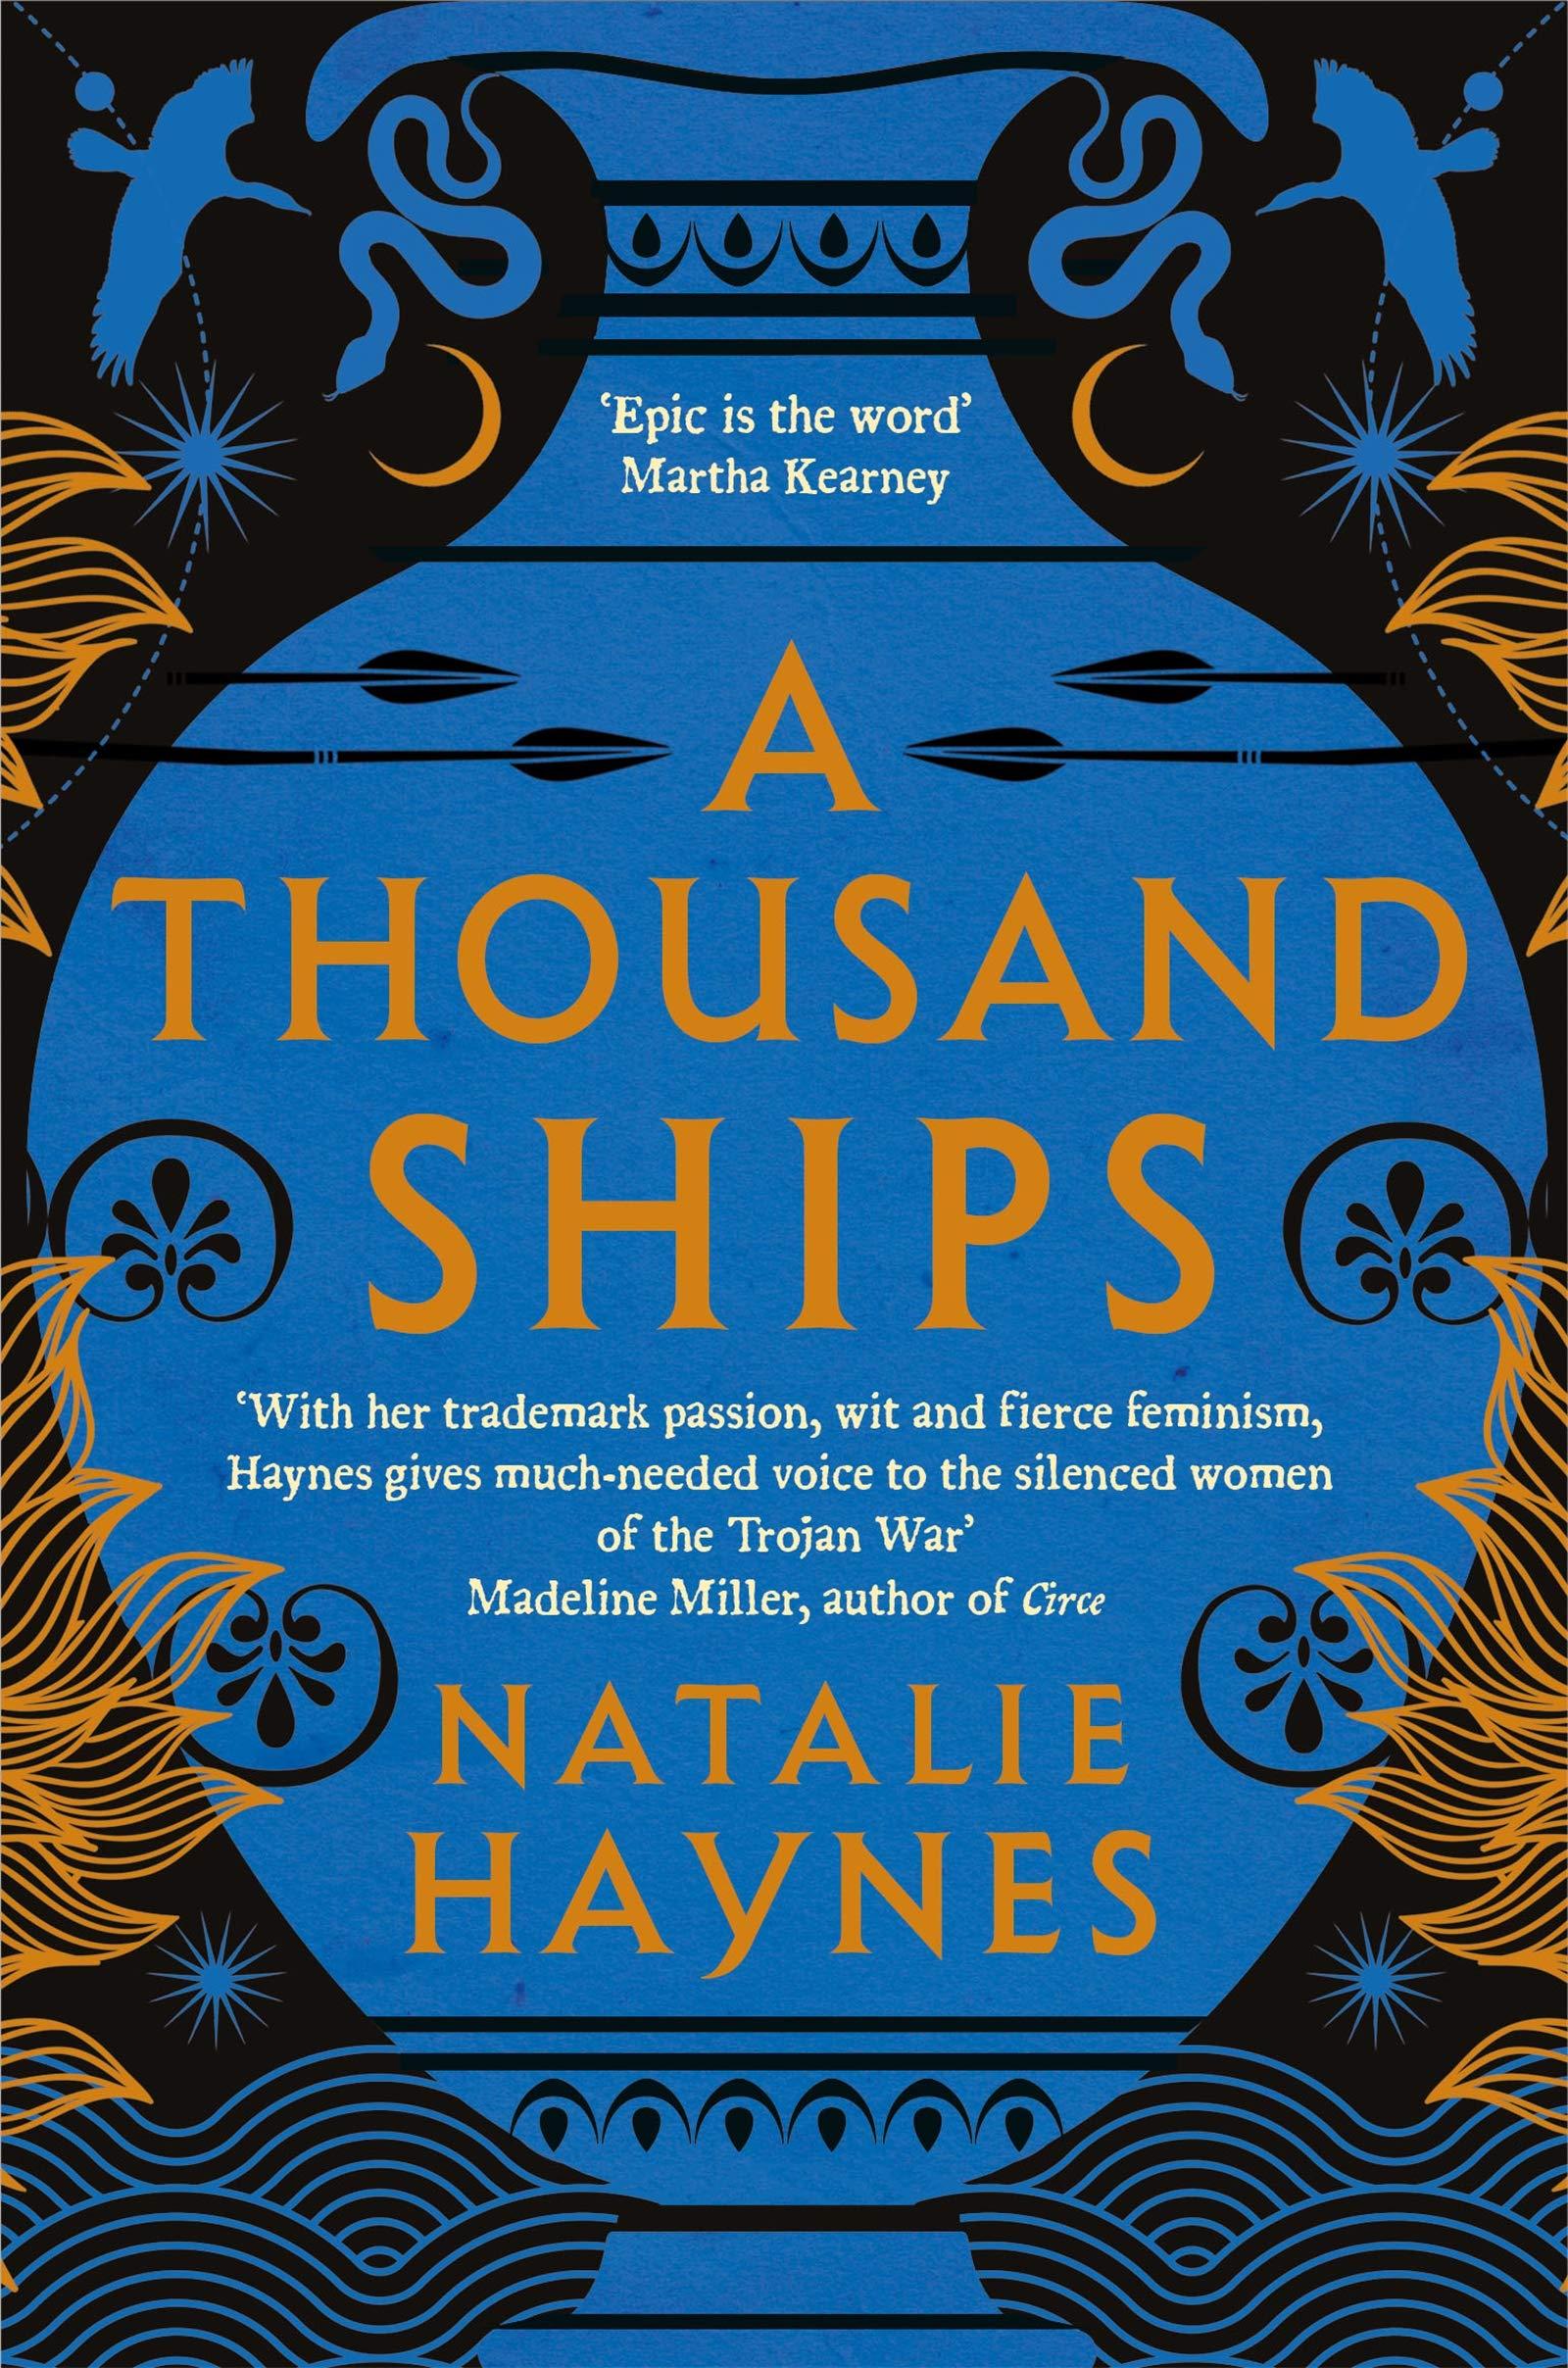 A Thousand Ships: Amazon.co.uk: Haynes, Natalie: 9781509836215: Books